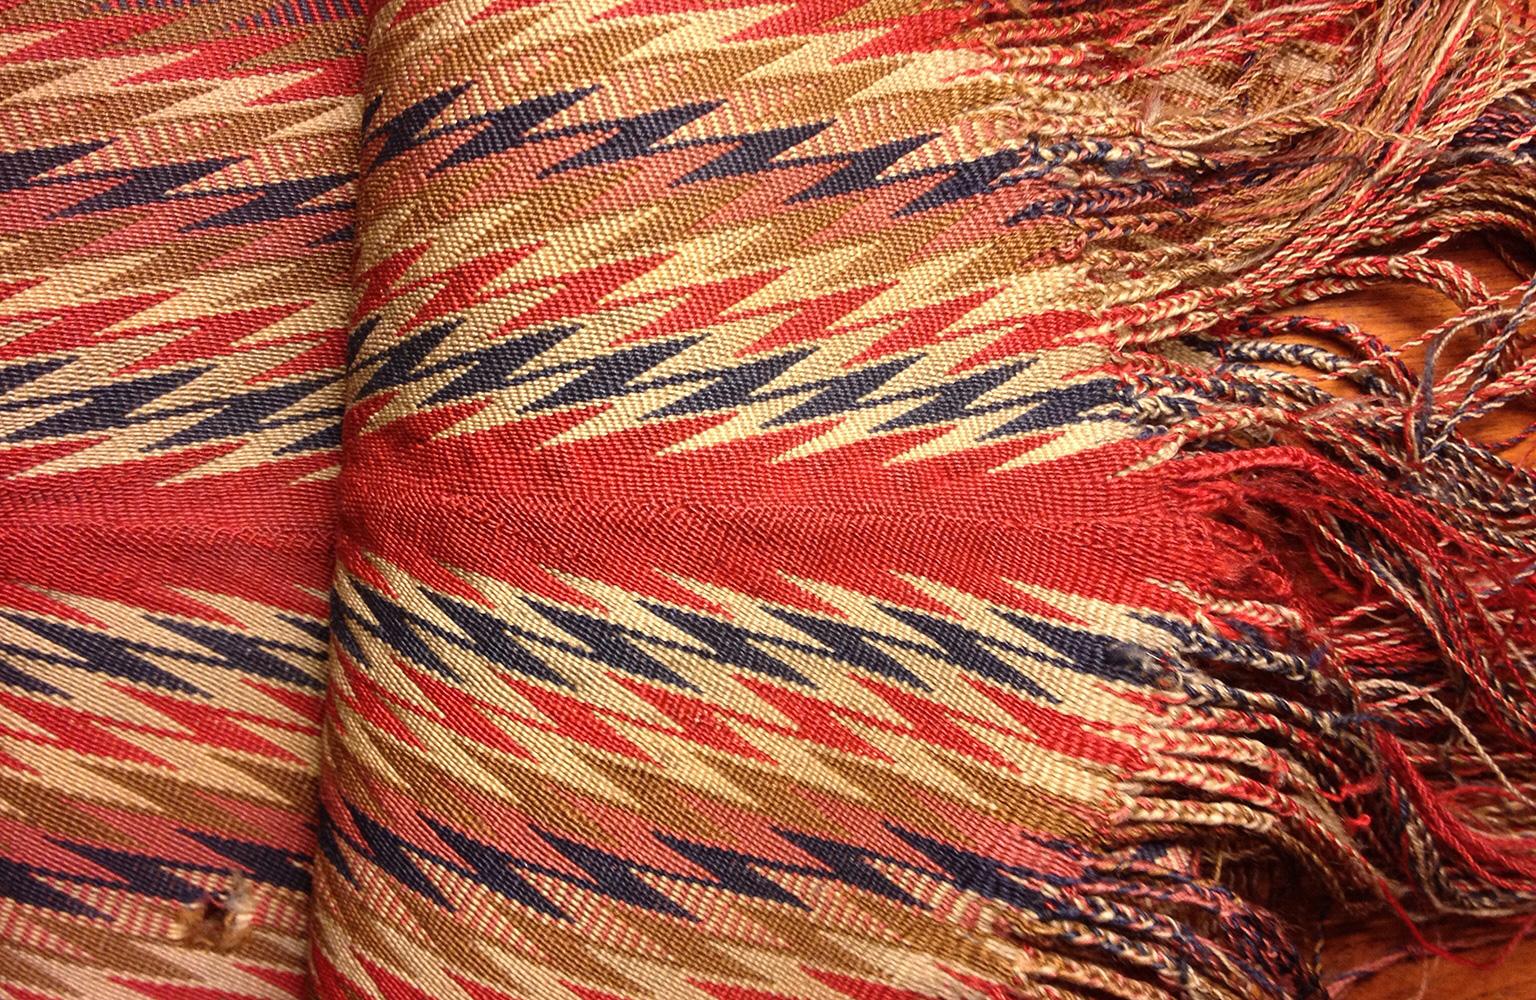 Weave a Metis Sash